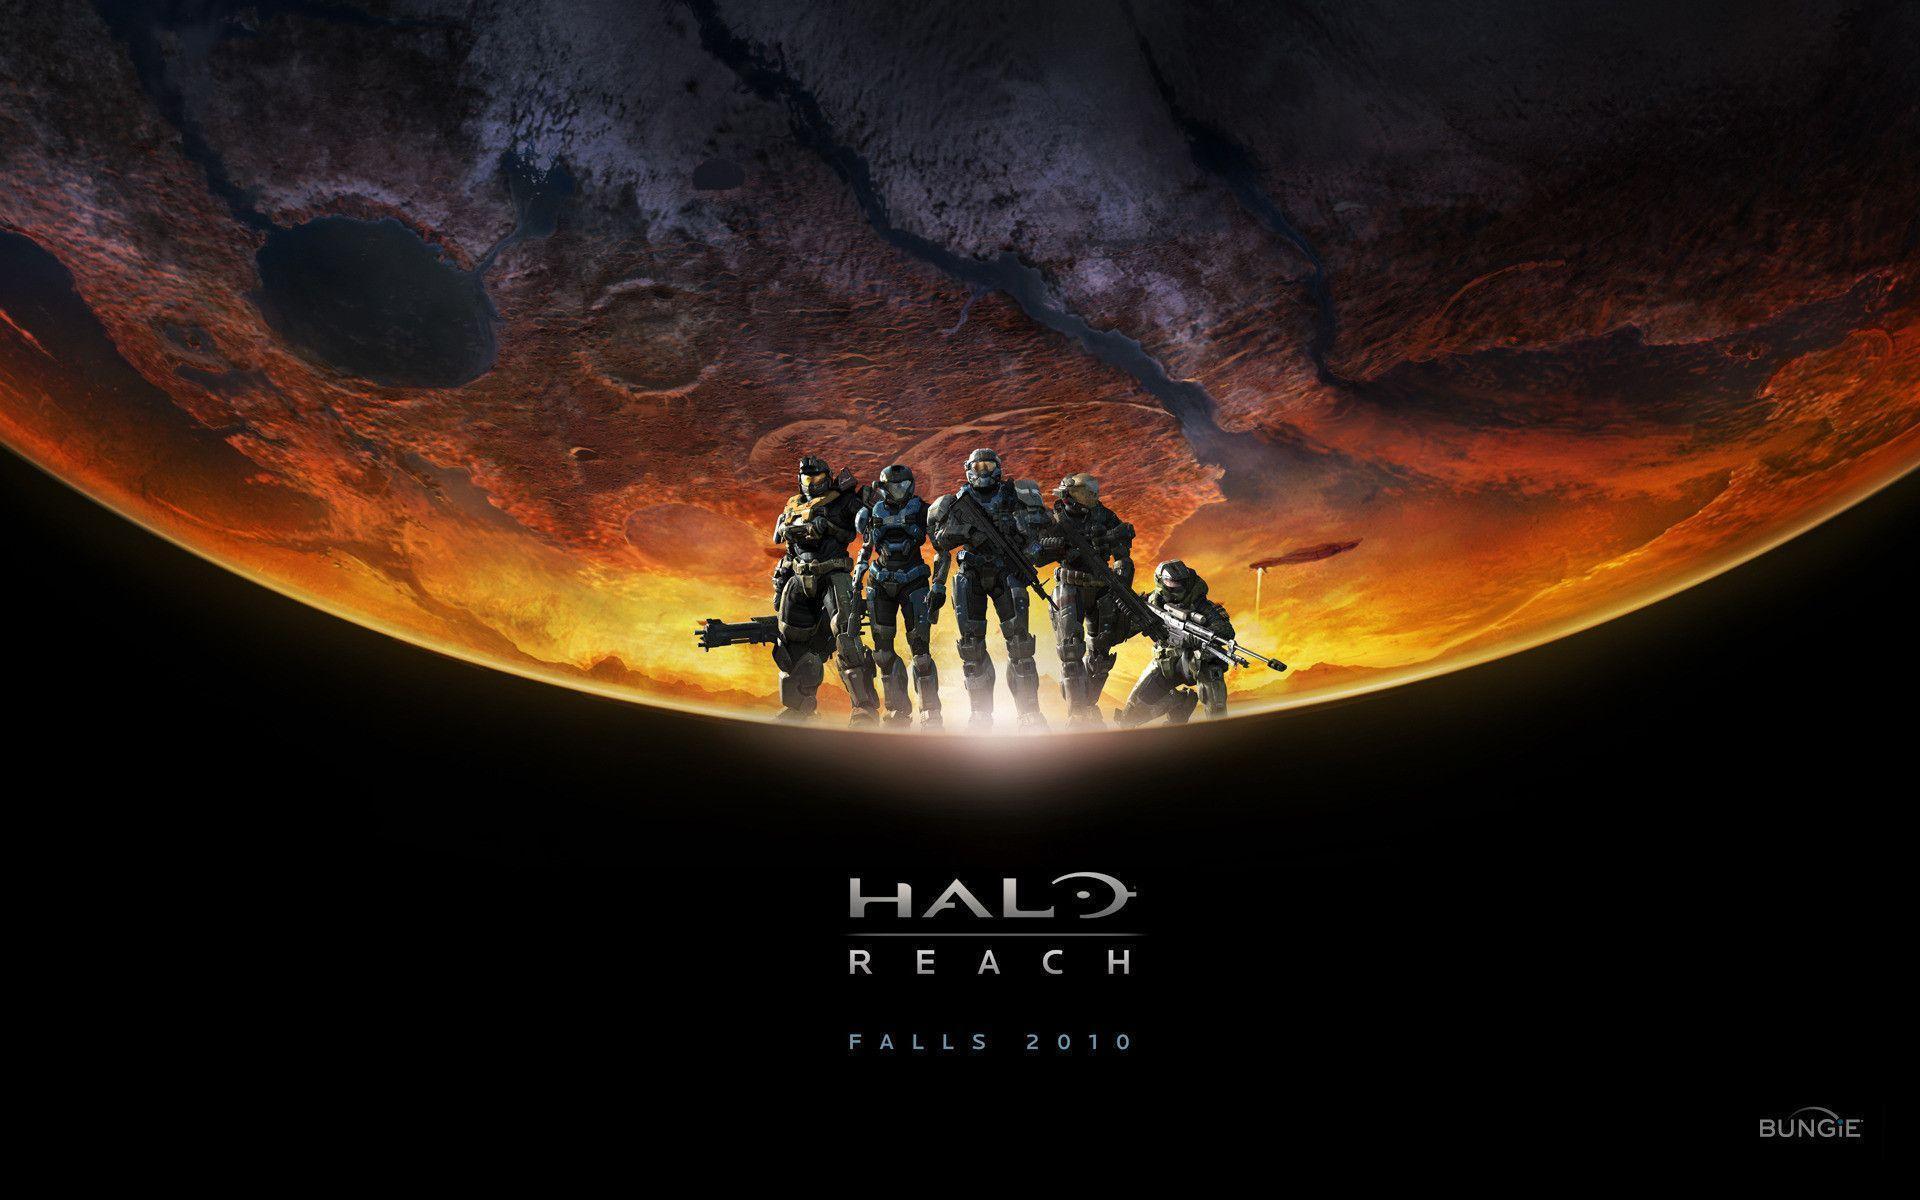 Halo Desktop Backgrounds - Wallpaper Cave